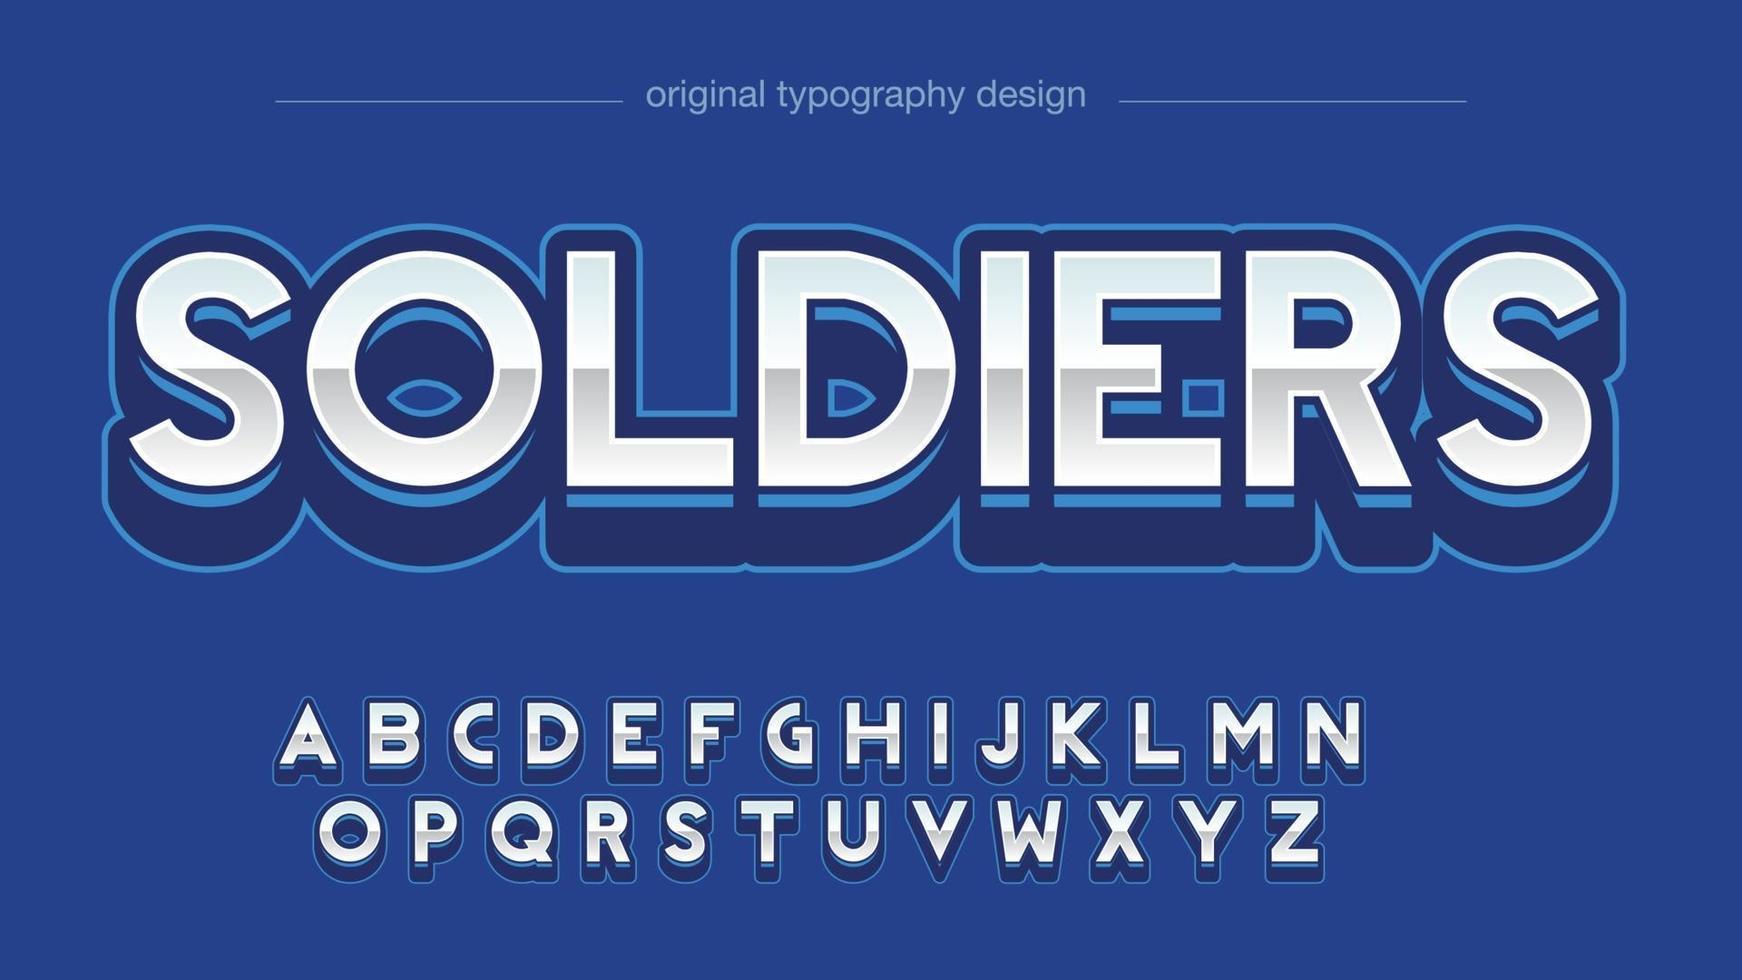 tipografia esportiva moderna azul metálico vetor